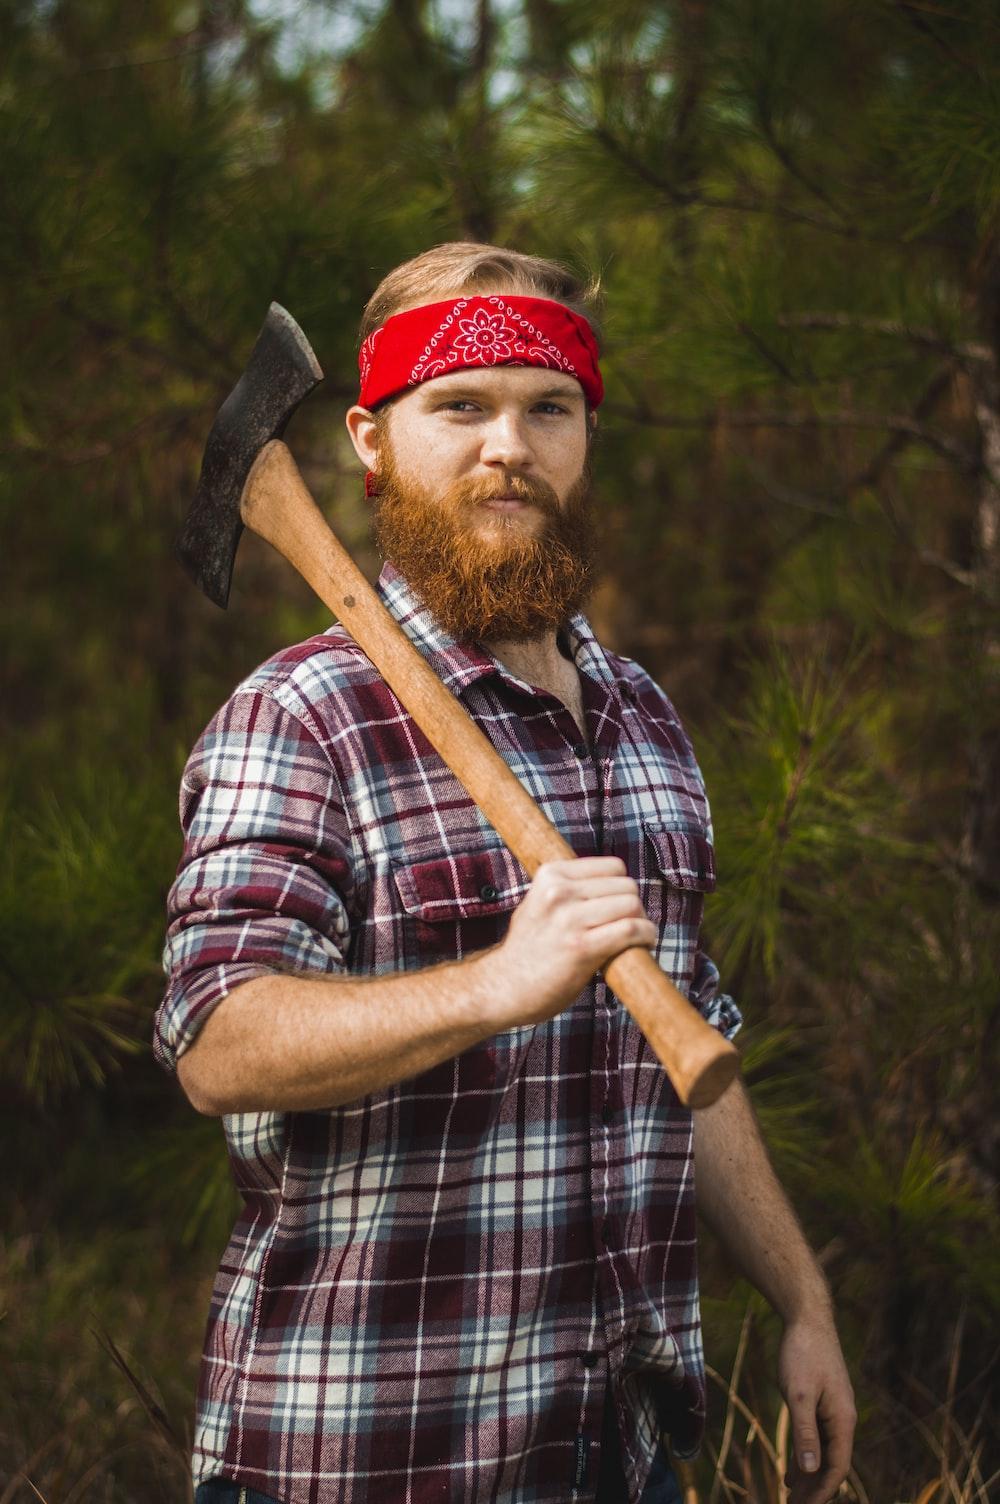 man carrying double-head axe